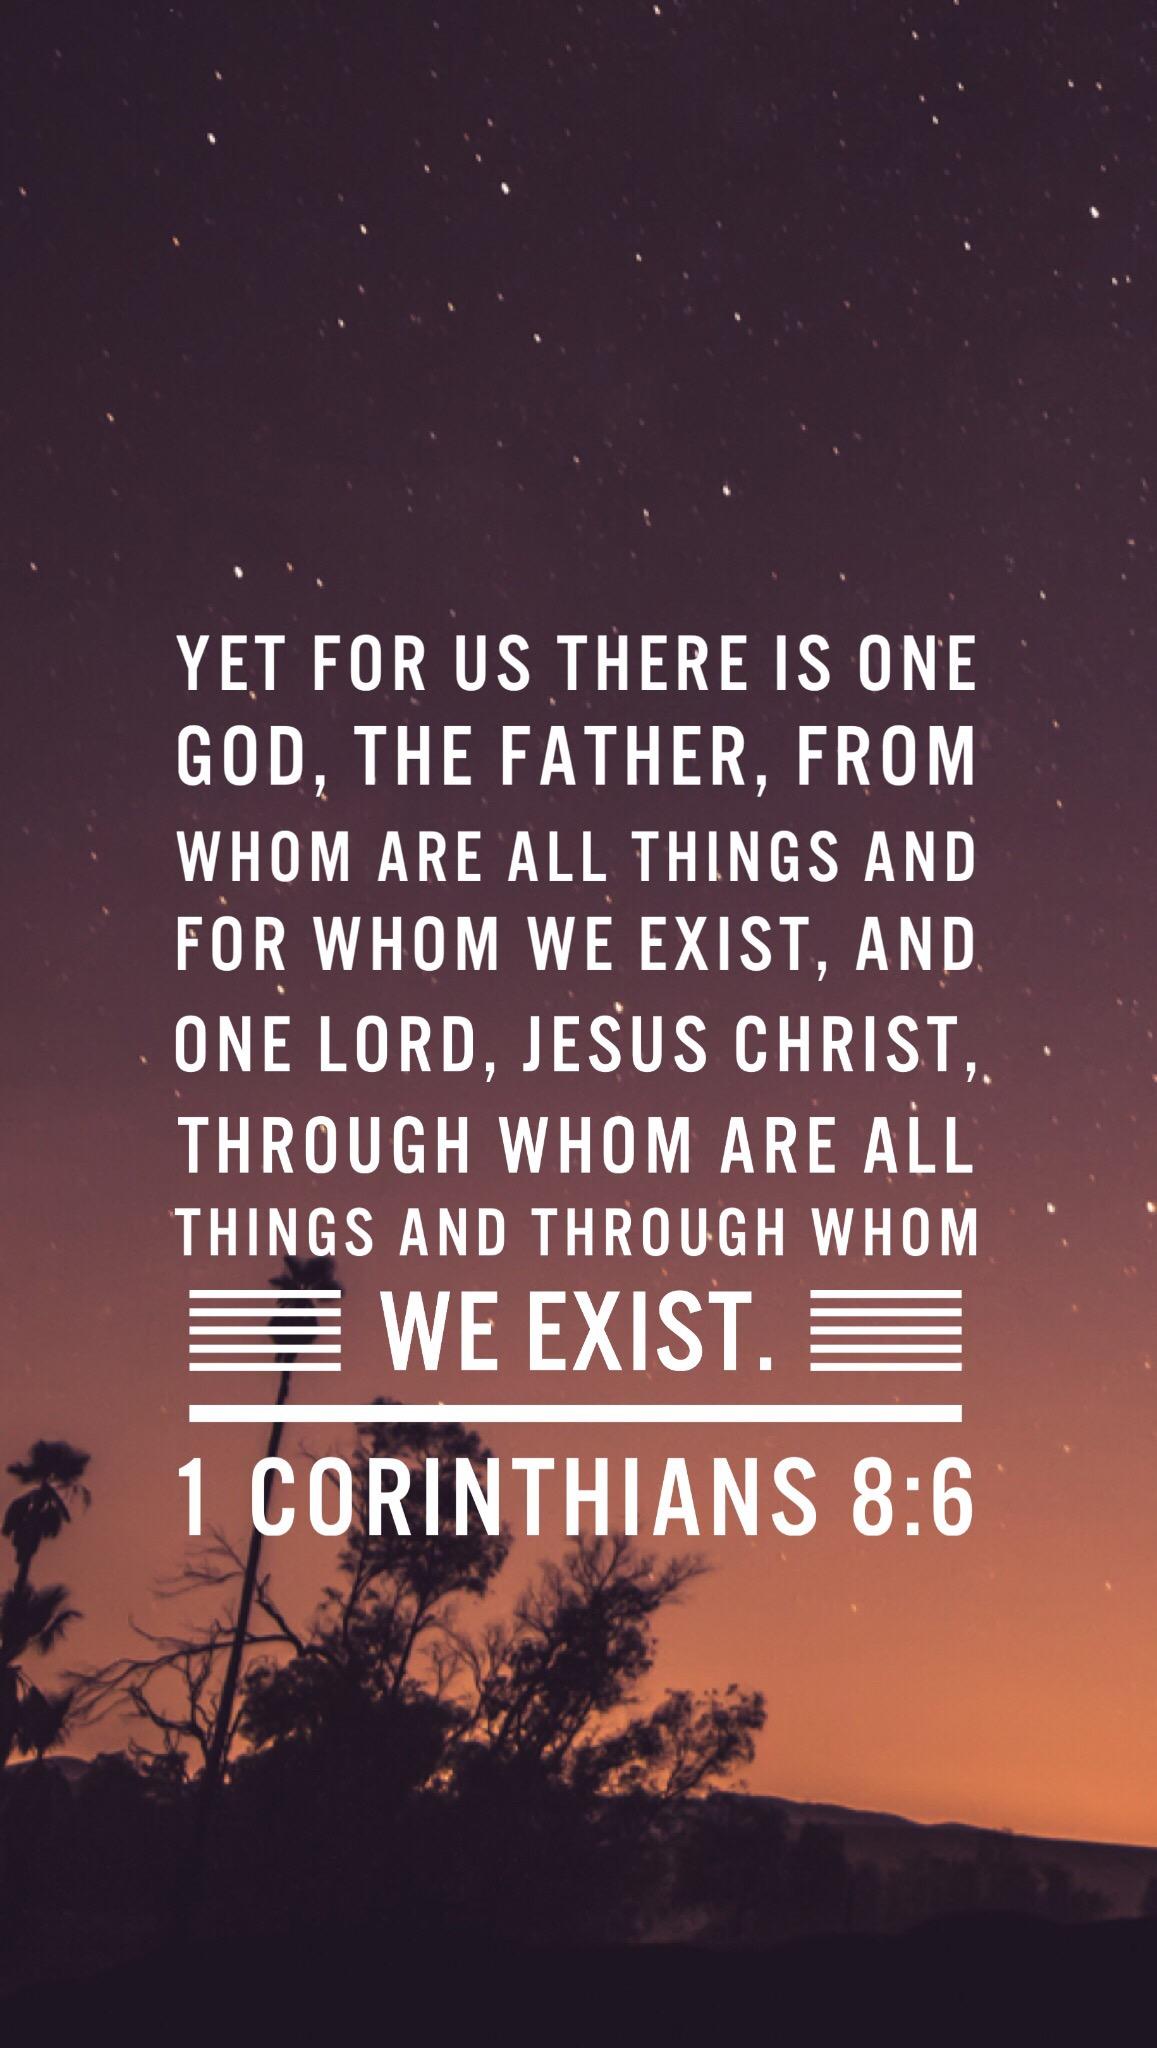 1 Corinthians 8.6.JPG